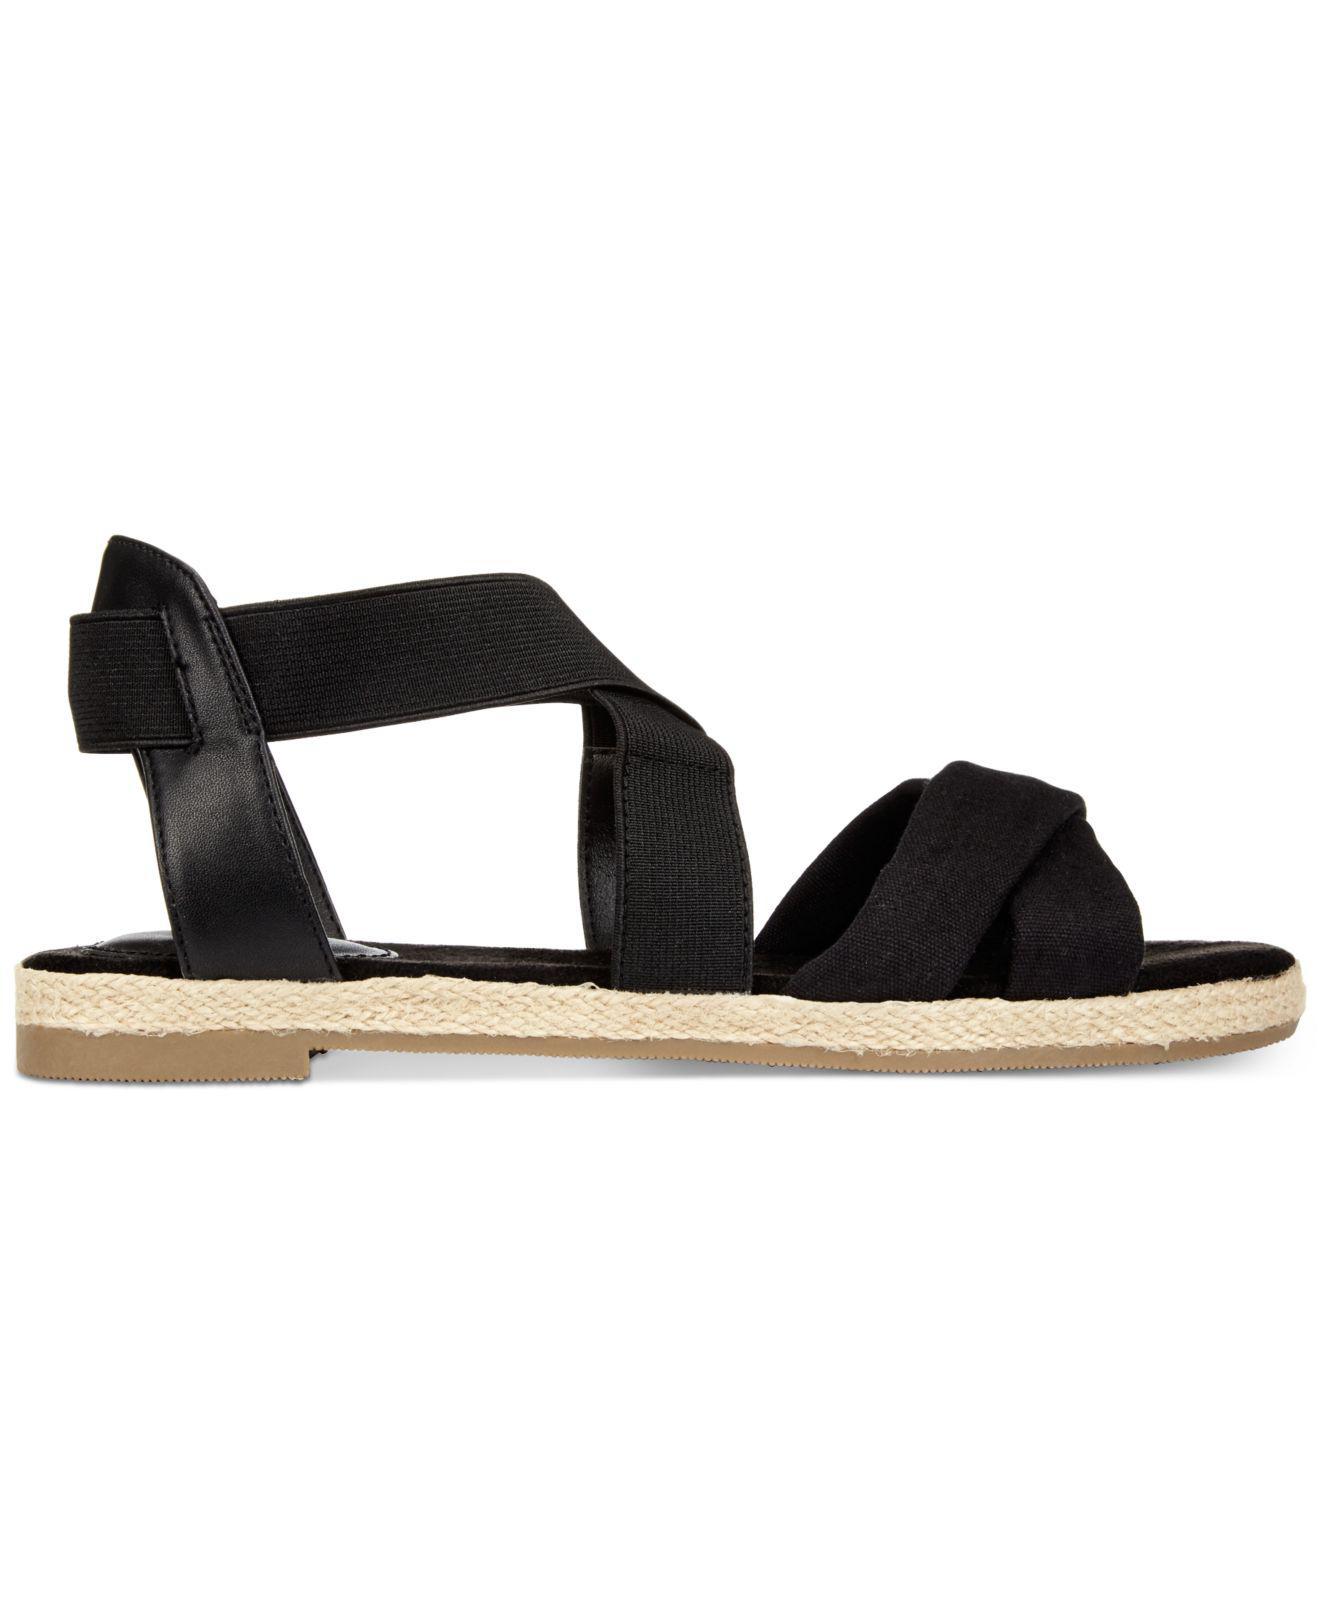 6cb26d14088333 Giani Bernini Colbey Memory Foam Sandals